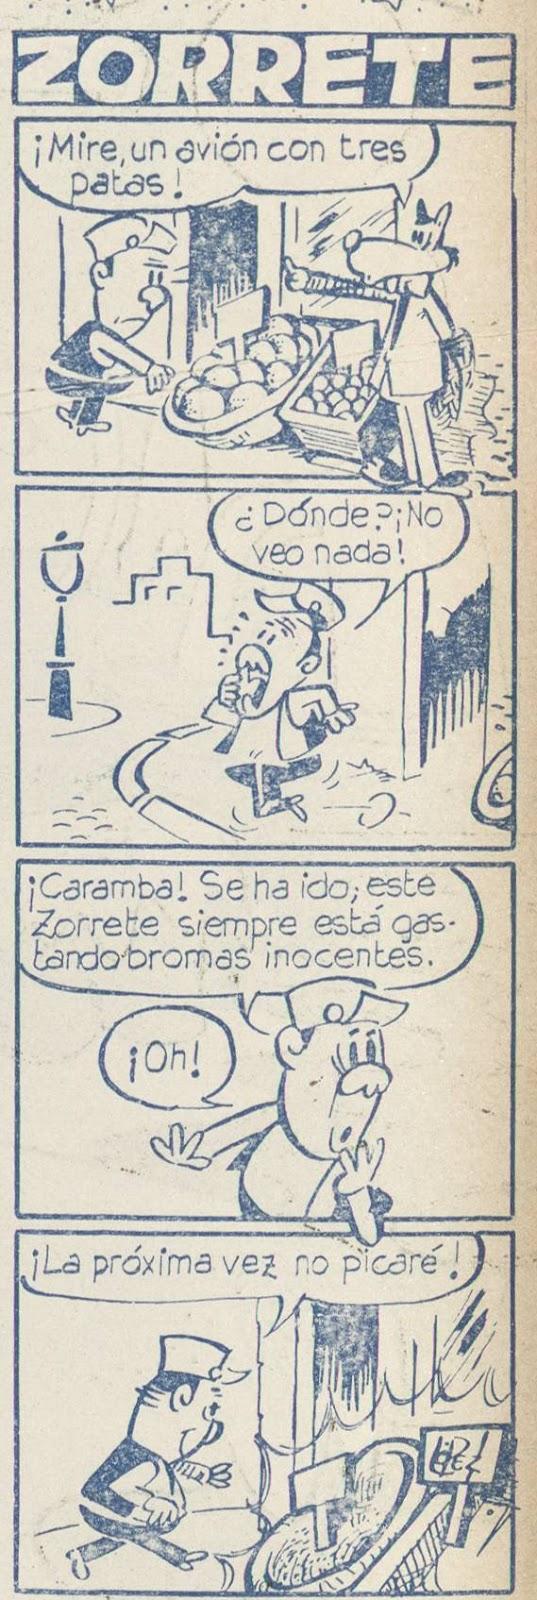 Zorrete, por Jan, Yumbo nº 229